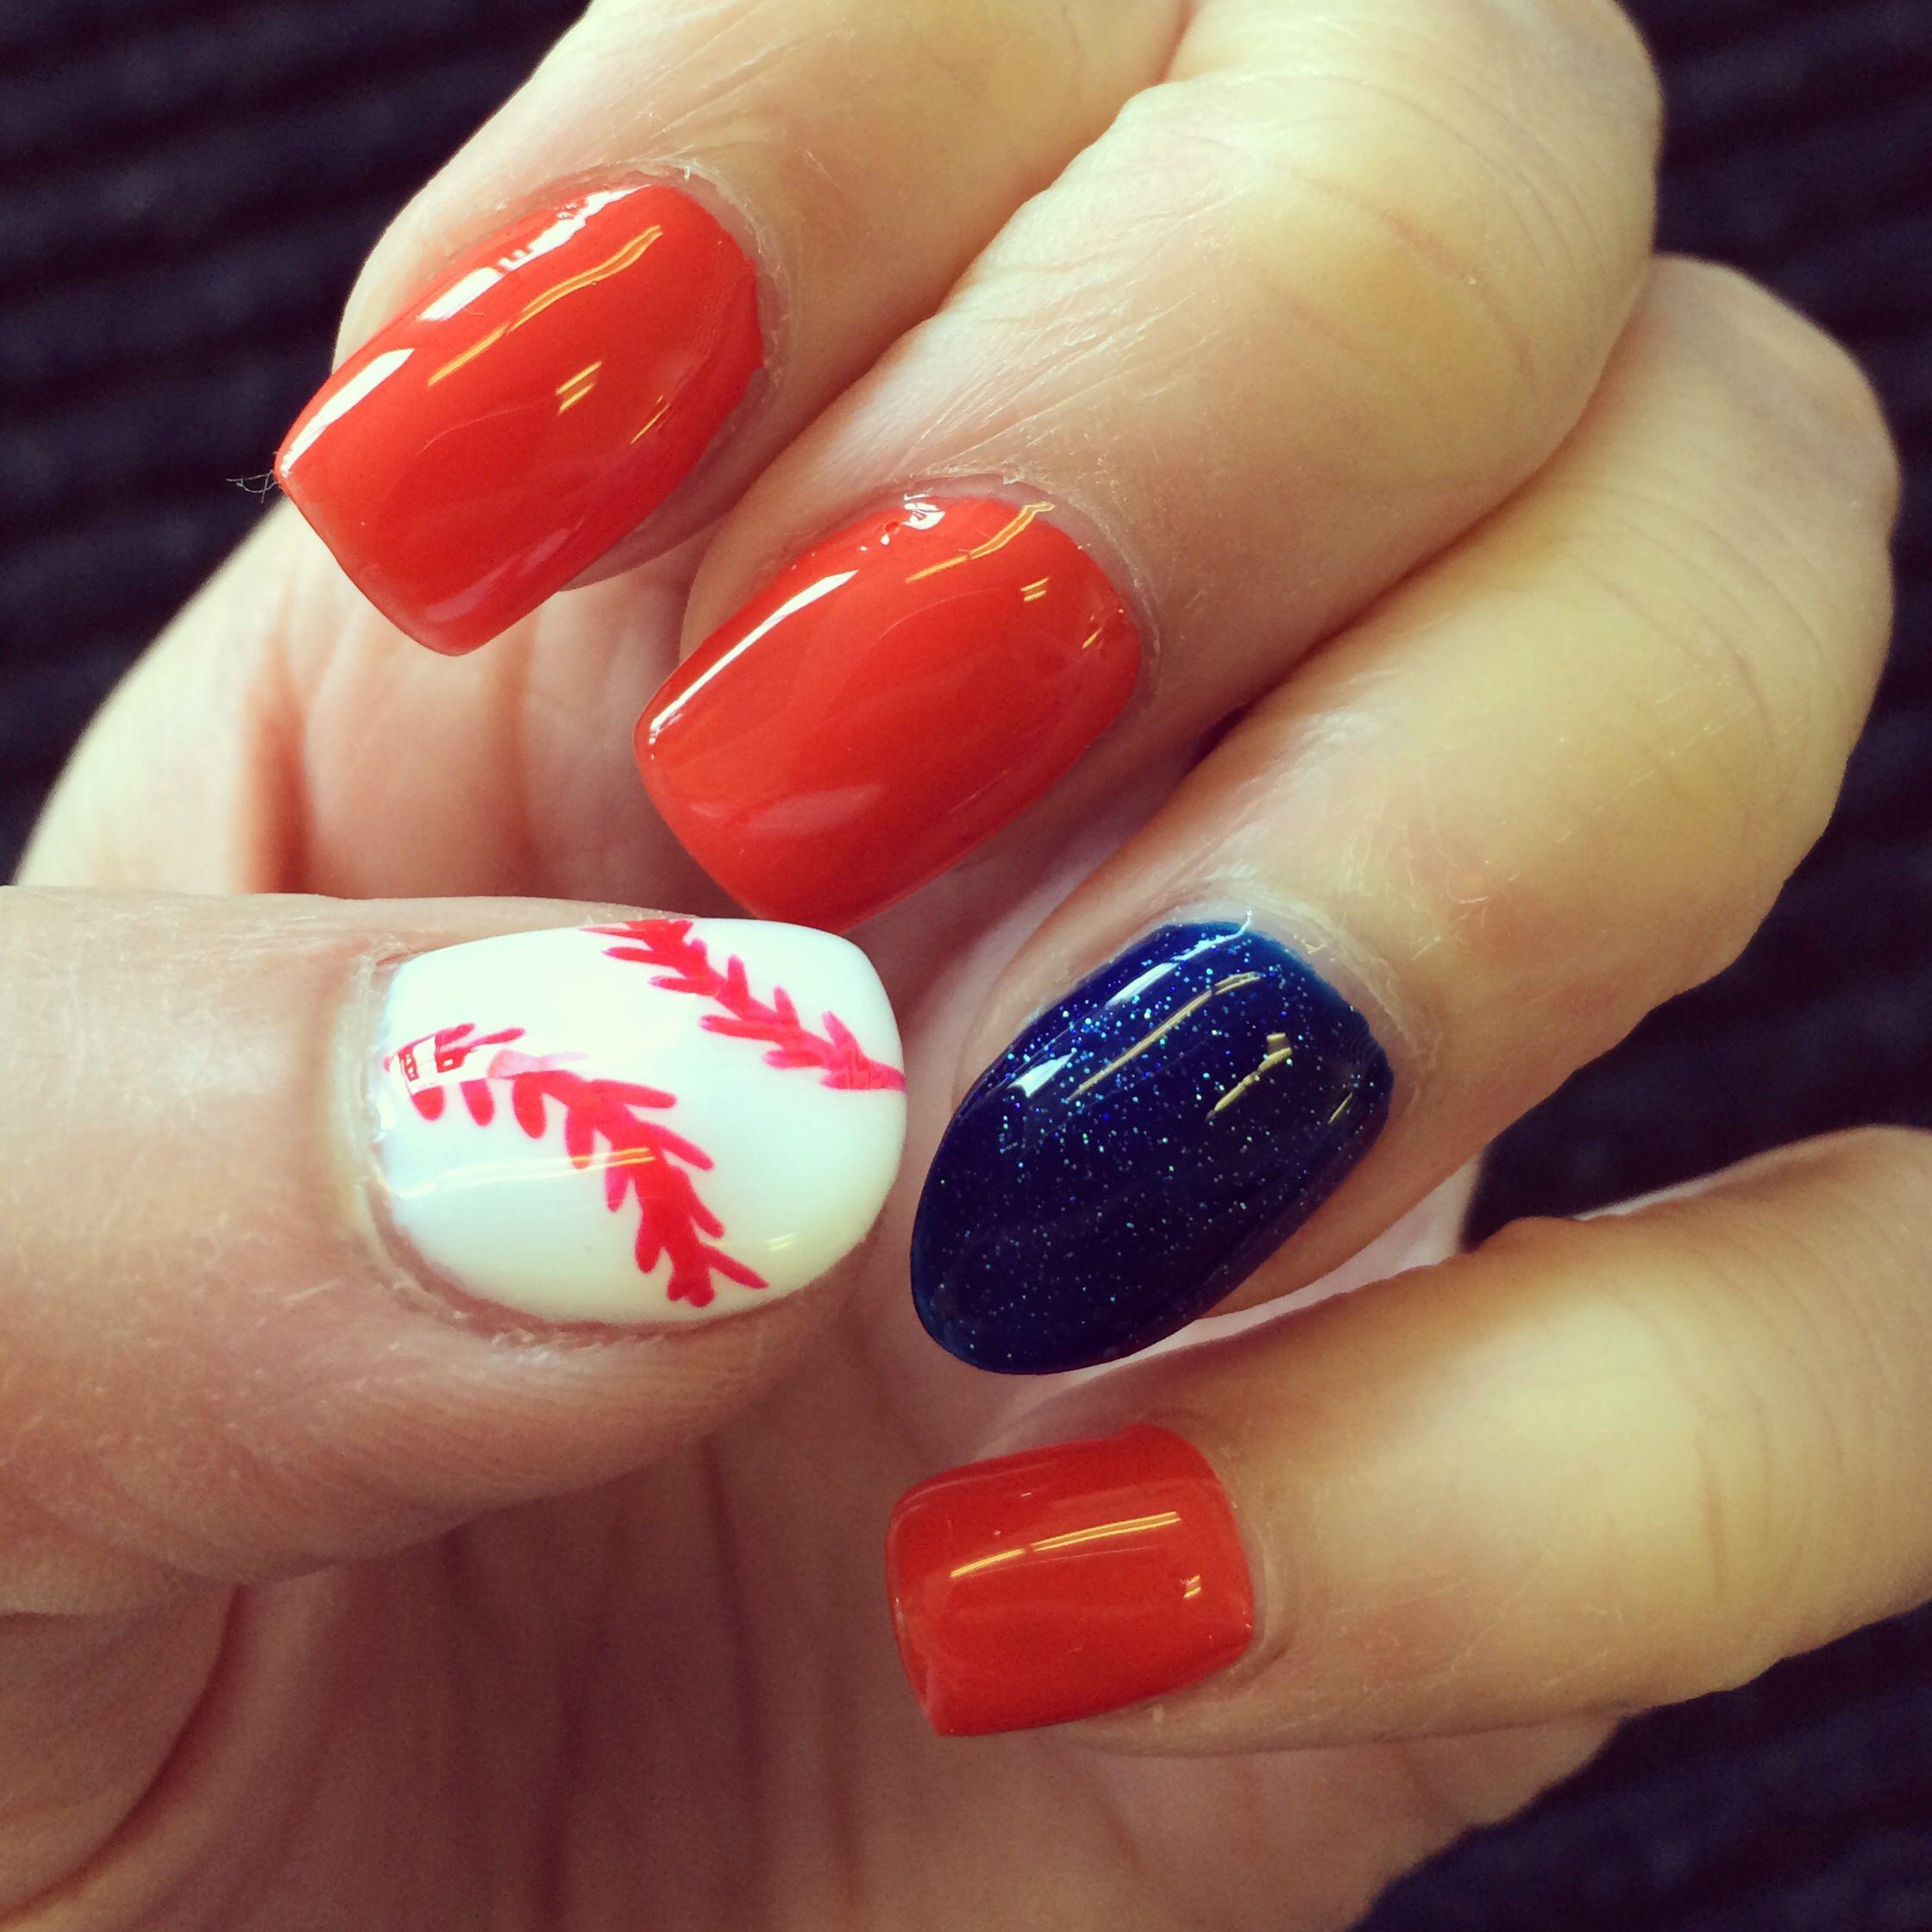 Detroit Tigers baseball nail art design | Fashion | Pinterest ...